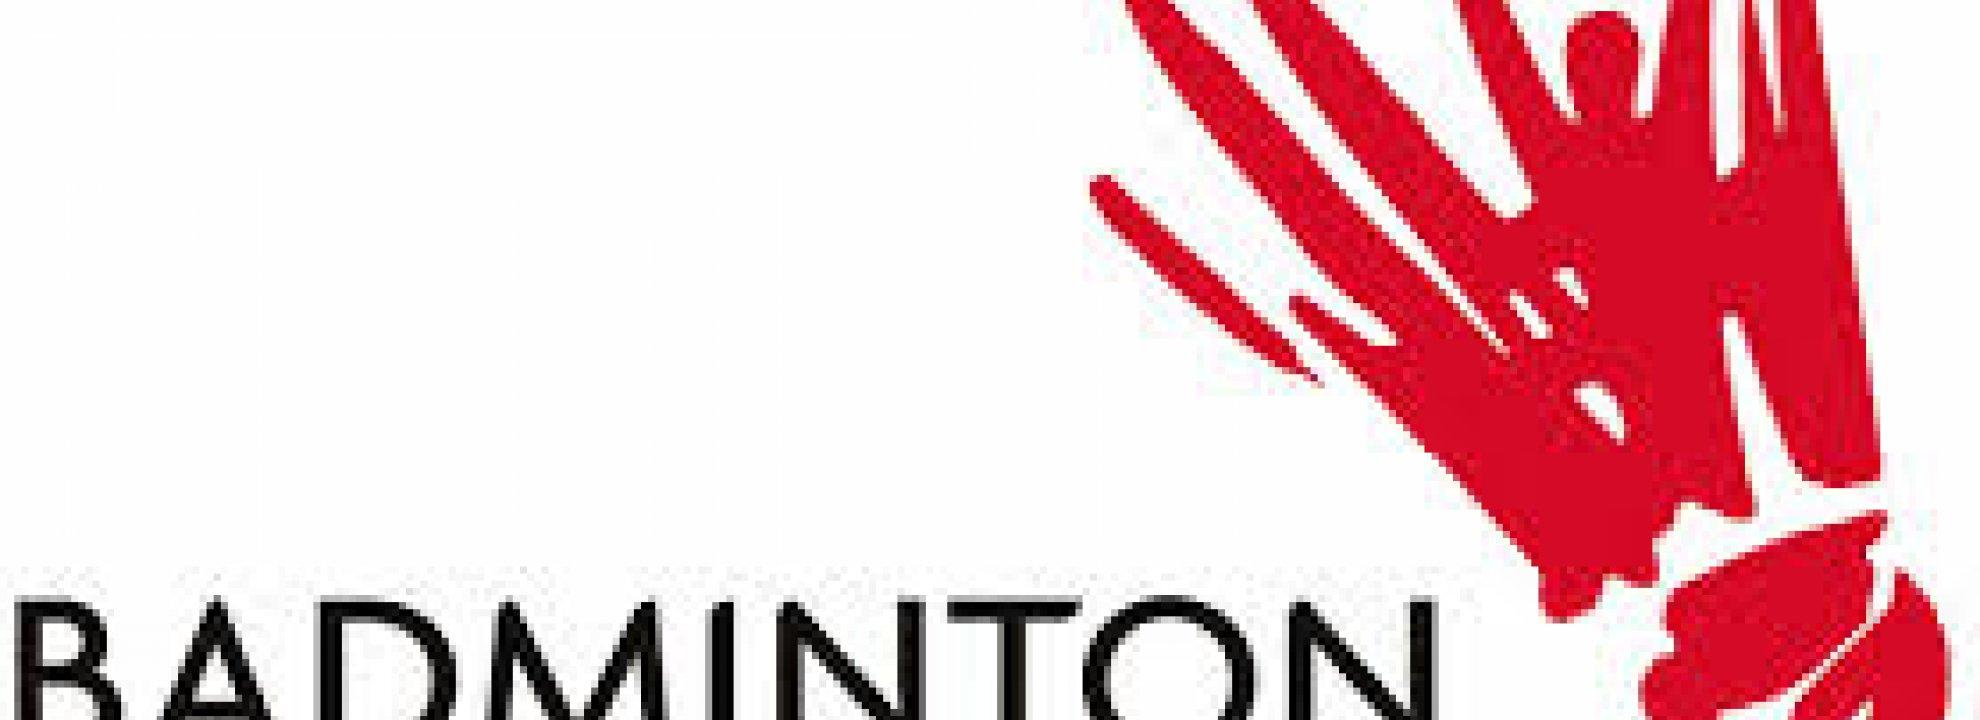 Social Badminton Competition Banner